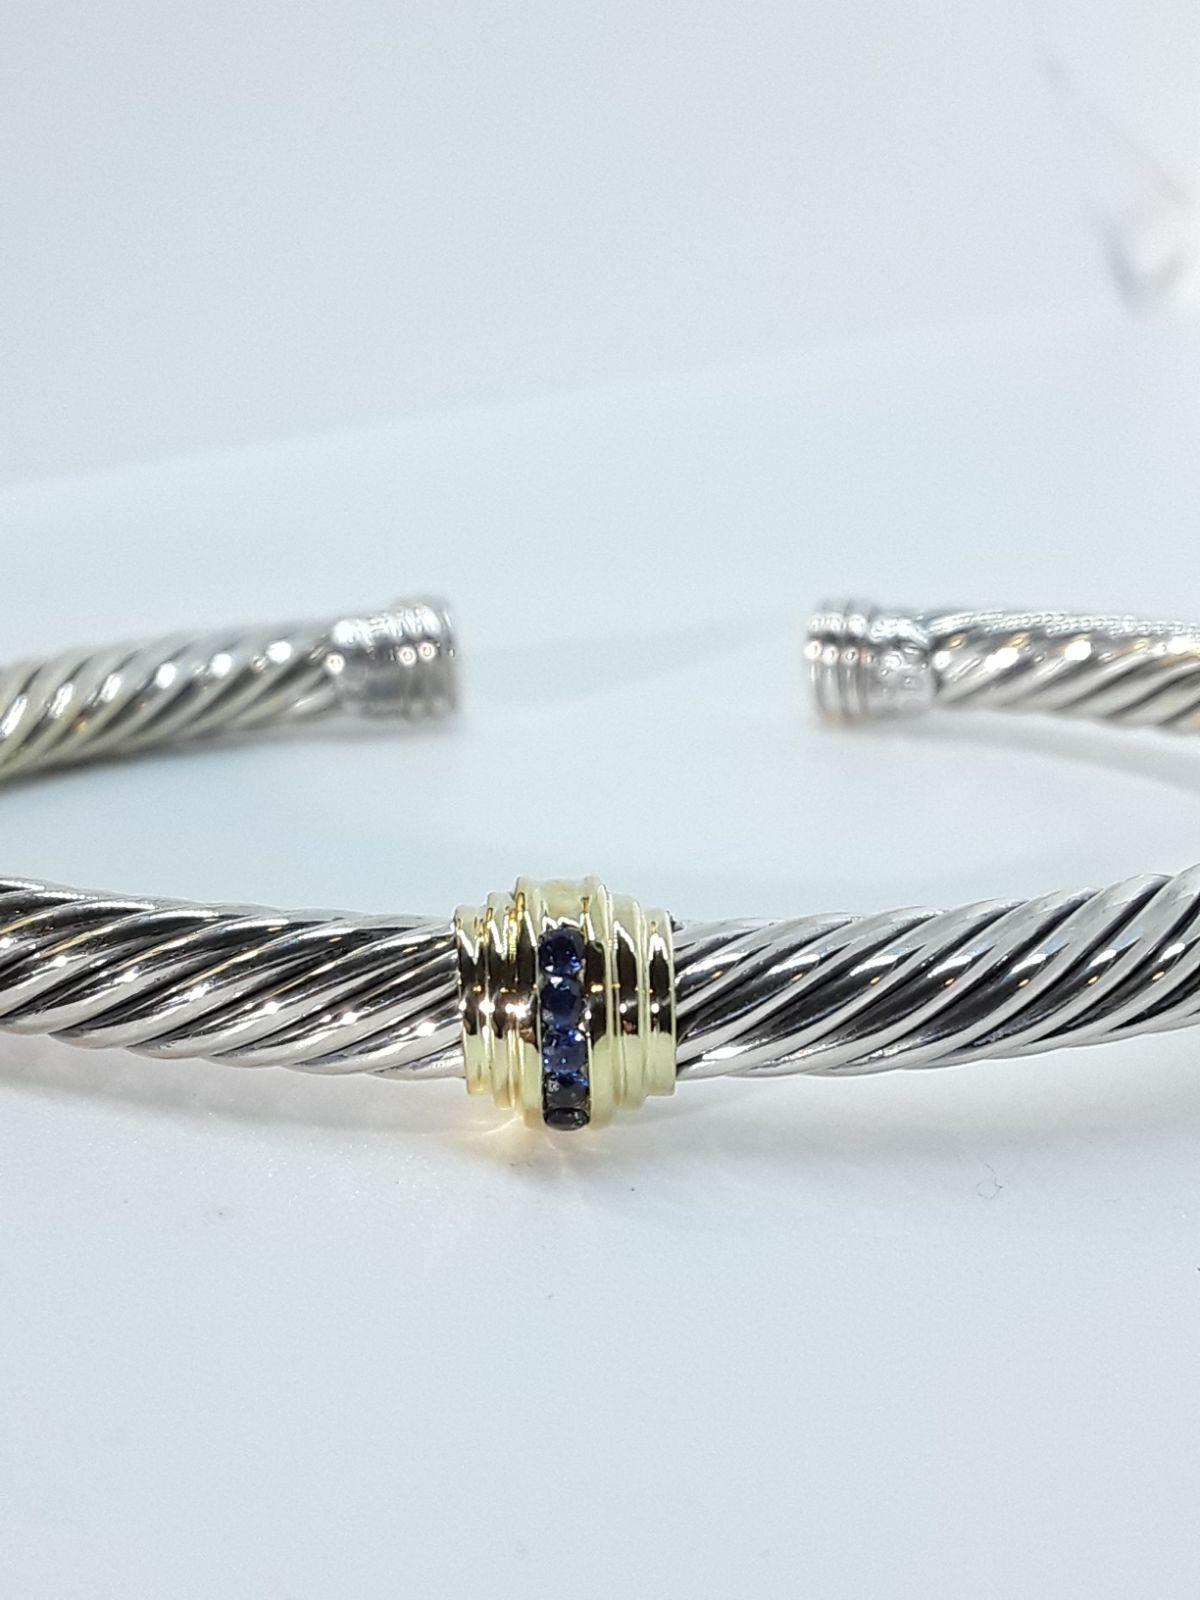 Classic david yurman 5mm single station cable bangle bracelet with blue sapphire